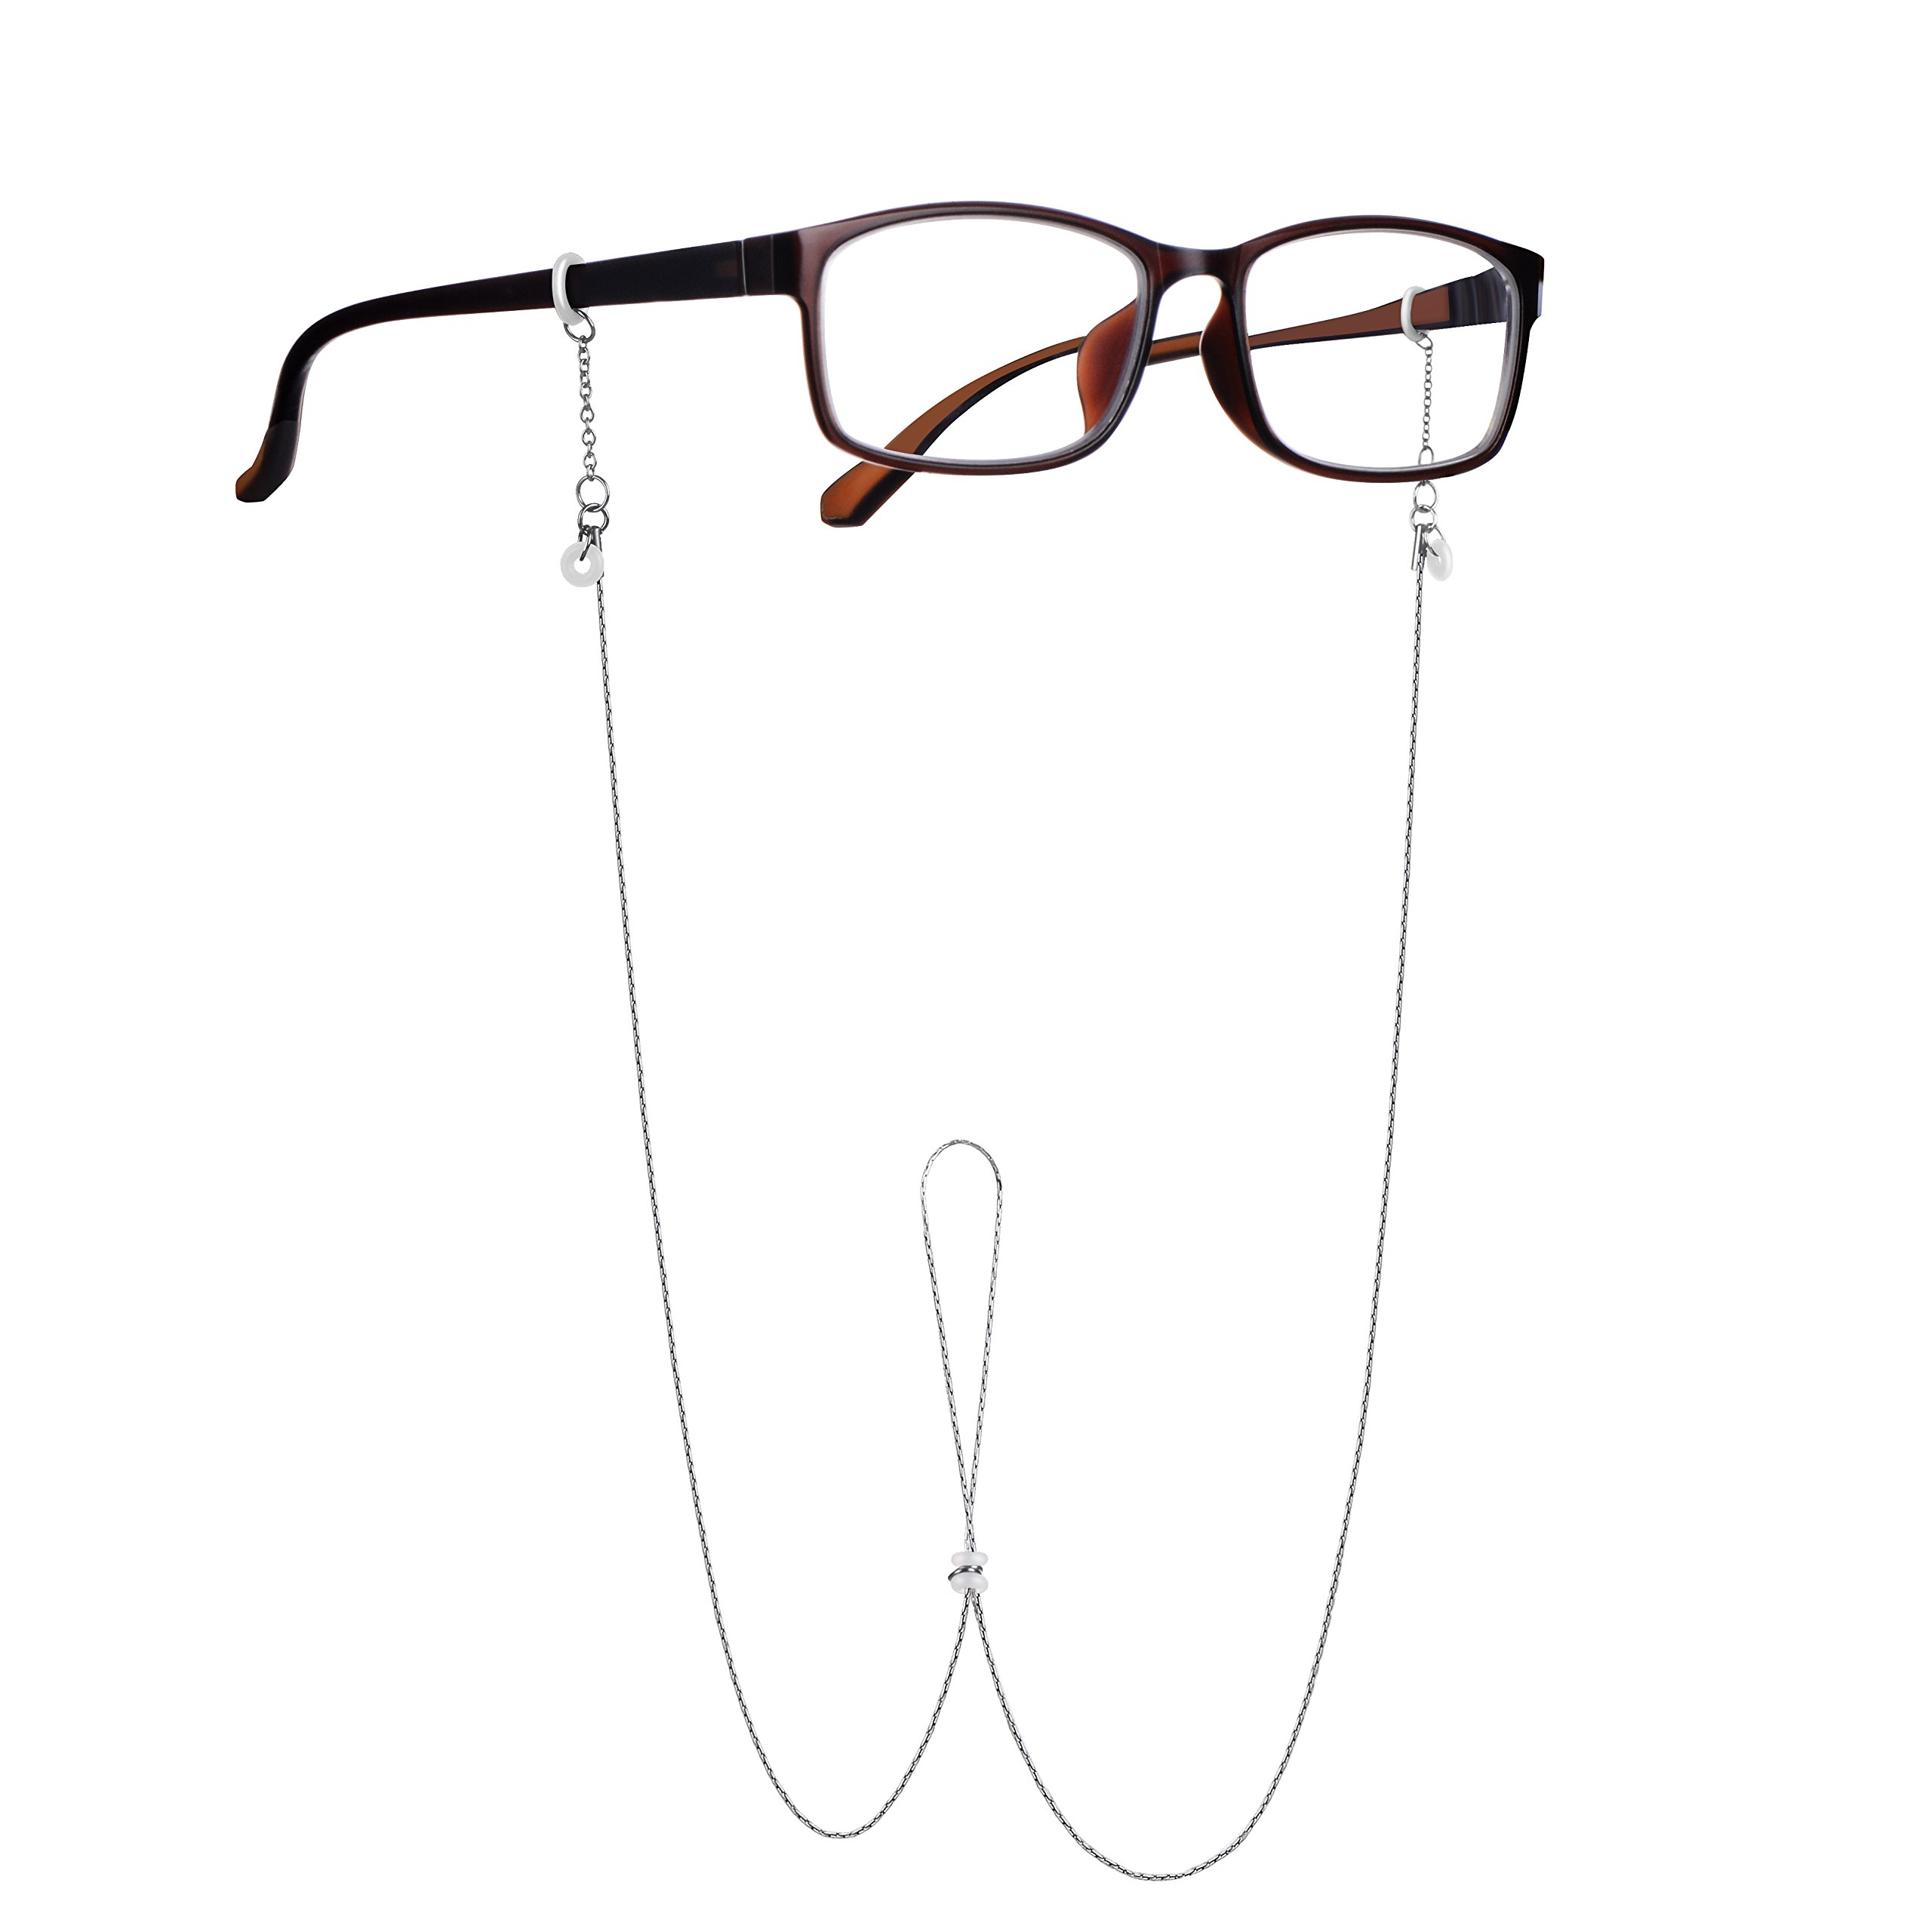 Unisex Eyeglass Chain, Reading Glass Chain, Simple &Considerate Design, Sunglass Strap